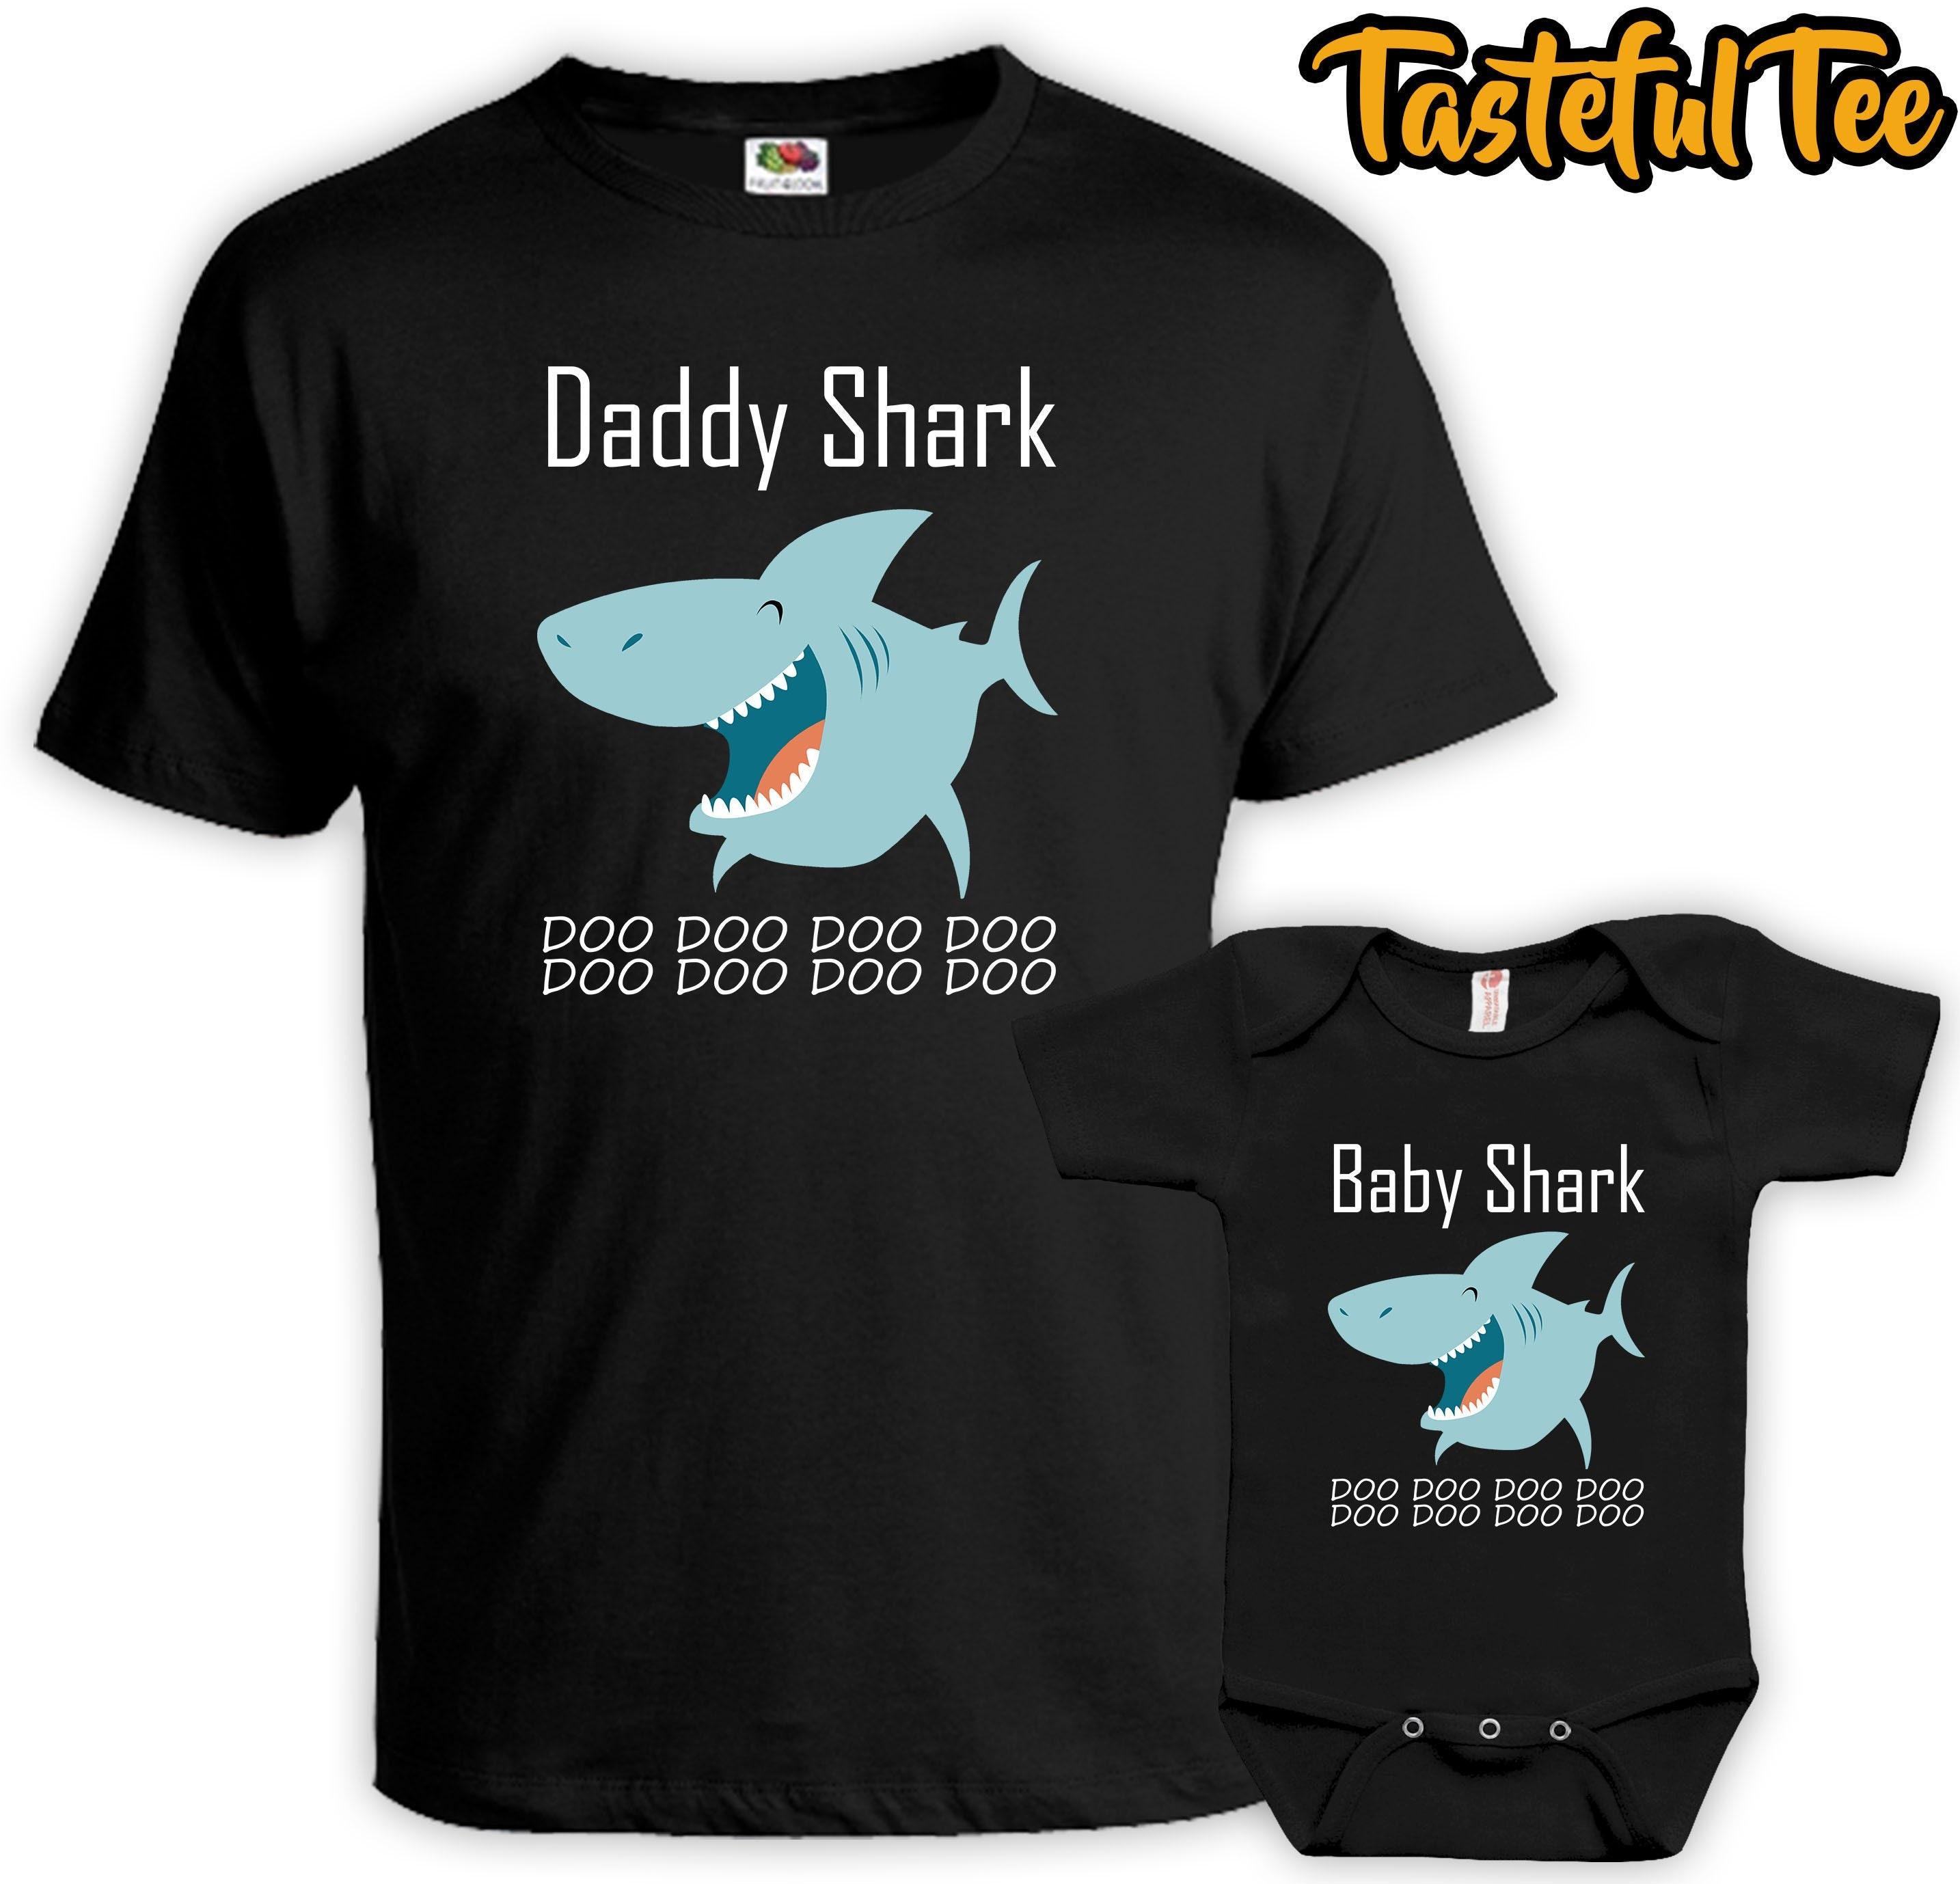 1c0cf4bb3e9c1 Baby Shark Matching Father Son Daughter Shirt Set Daddy Shark | Etsy